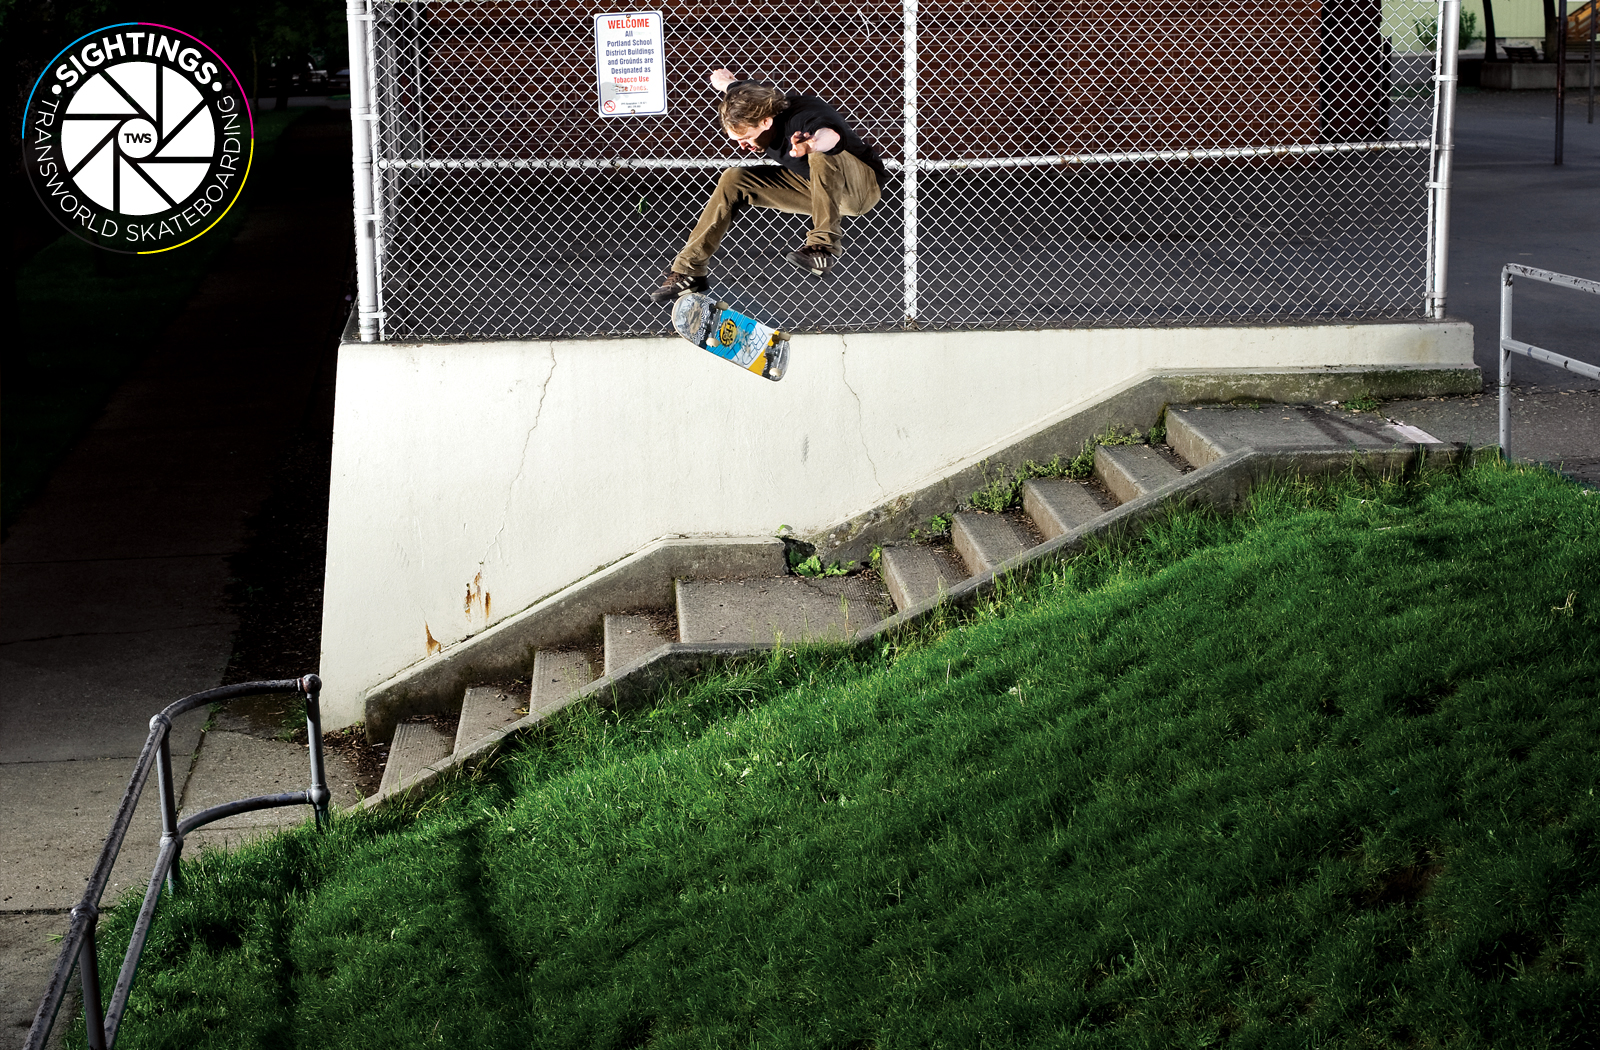 Transworld Skateboarding Wallpaper - WallpaperSafari